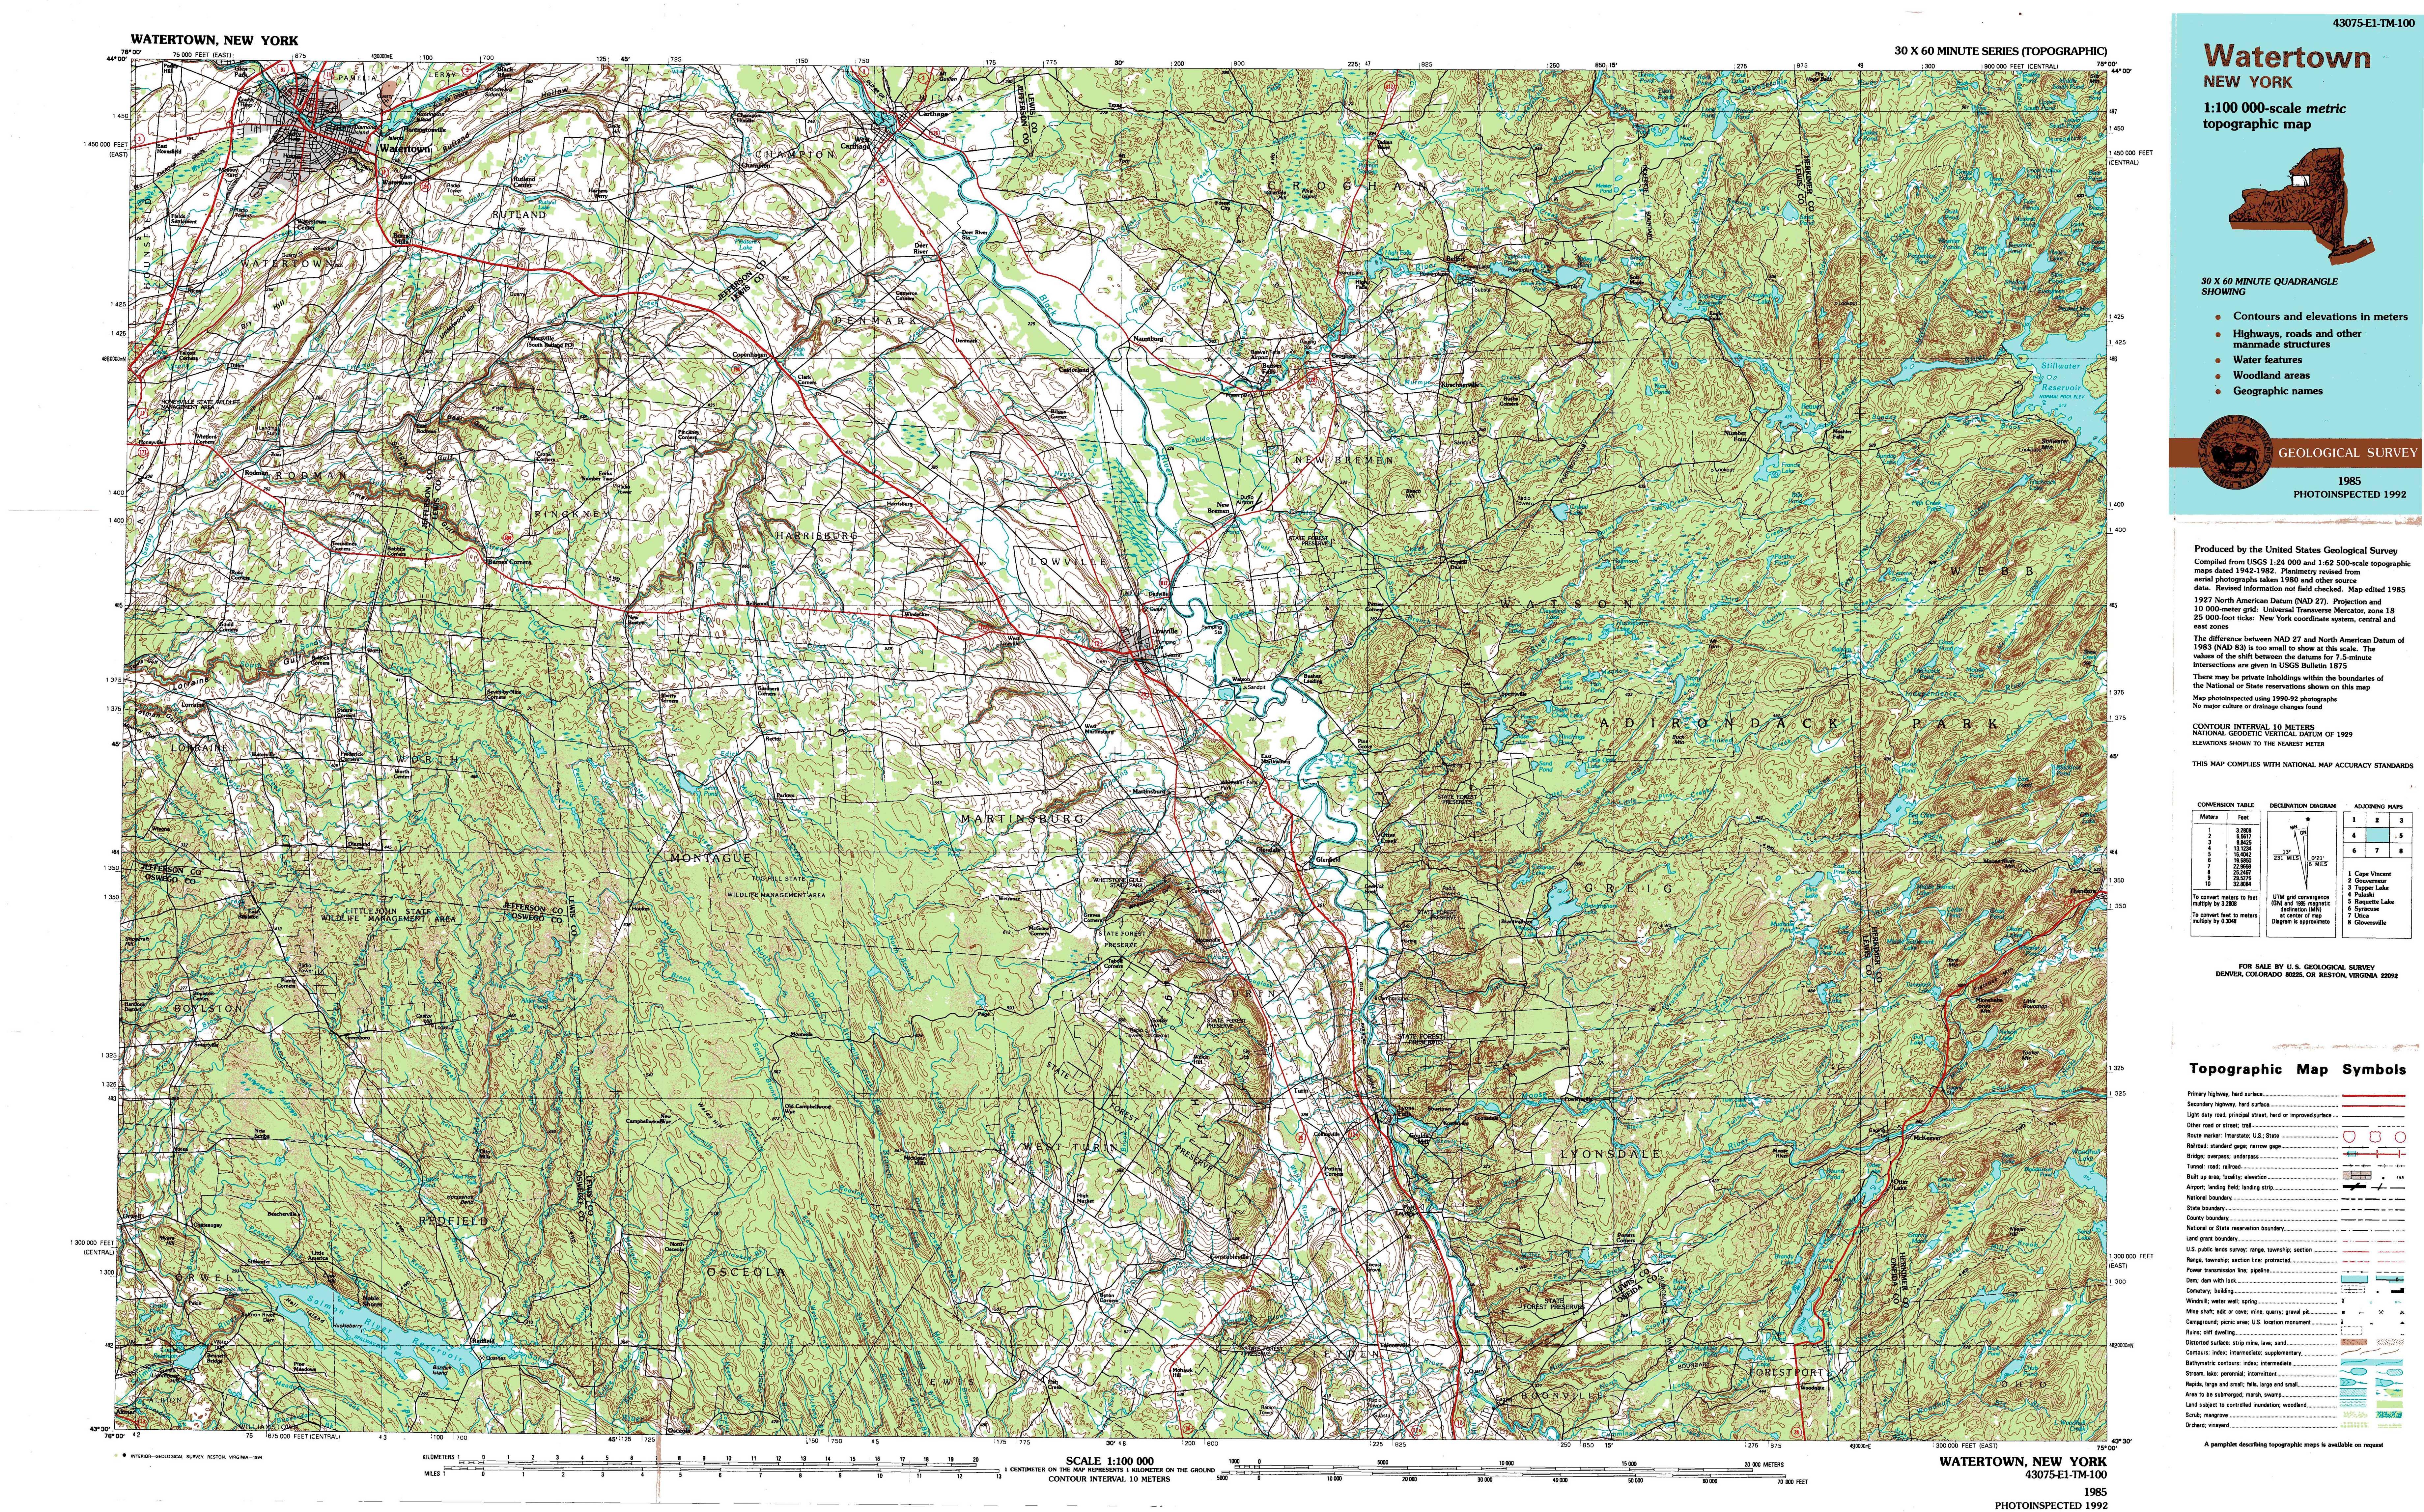 New York Topo Maps Topographic Maps - New york city elevation map